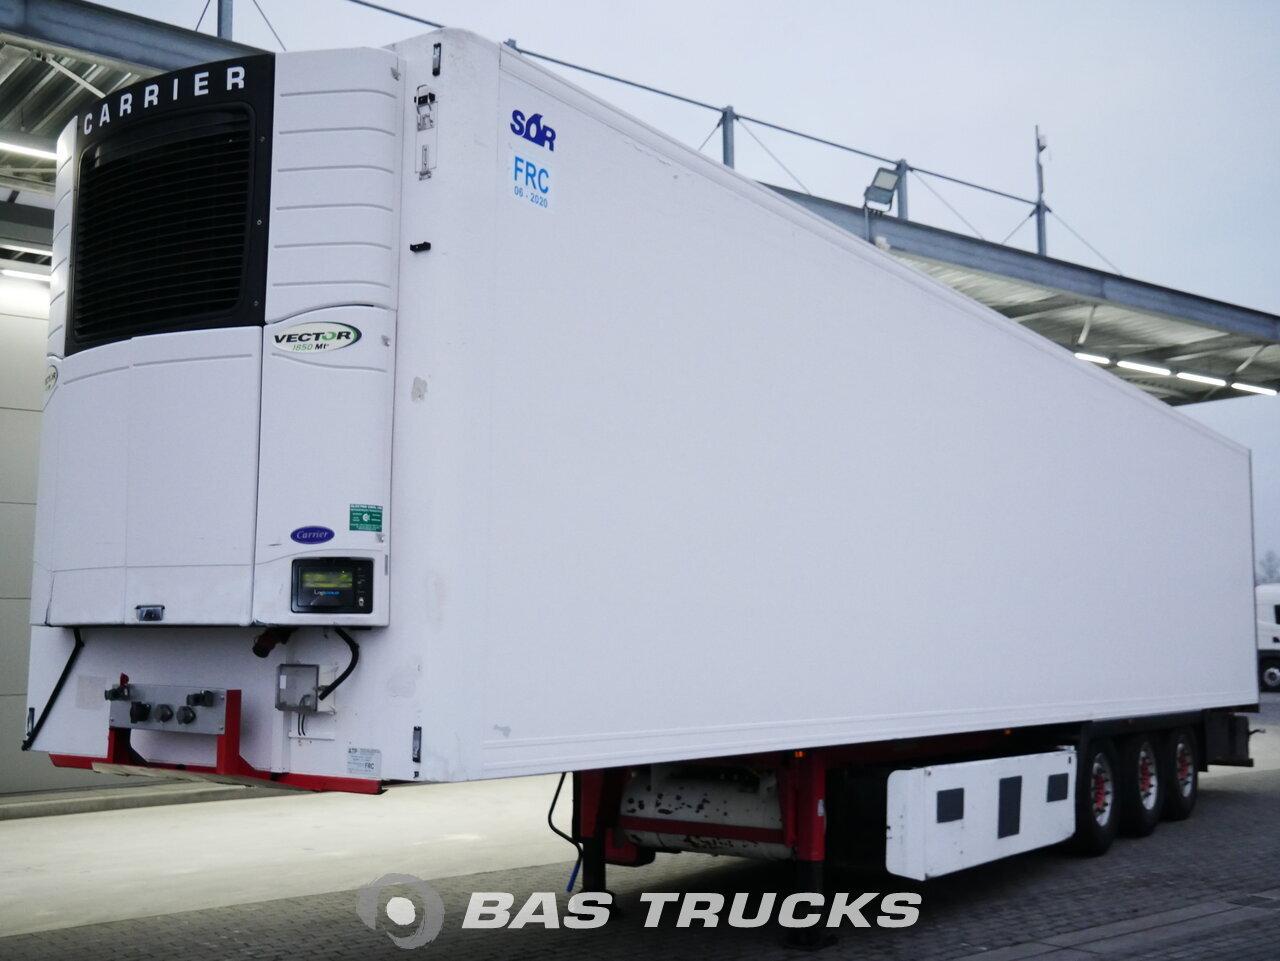 foto de Usado Semirremolque Lecsor Carrier Vector 1850mt Bi-temp Multitemp Doppelverdampfer Trennwand Ejes 2011